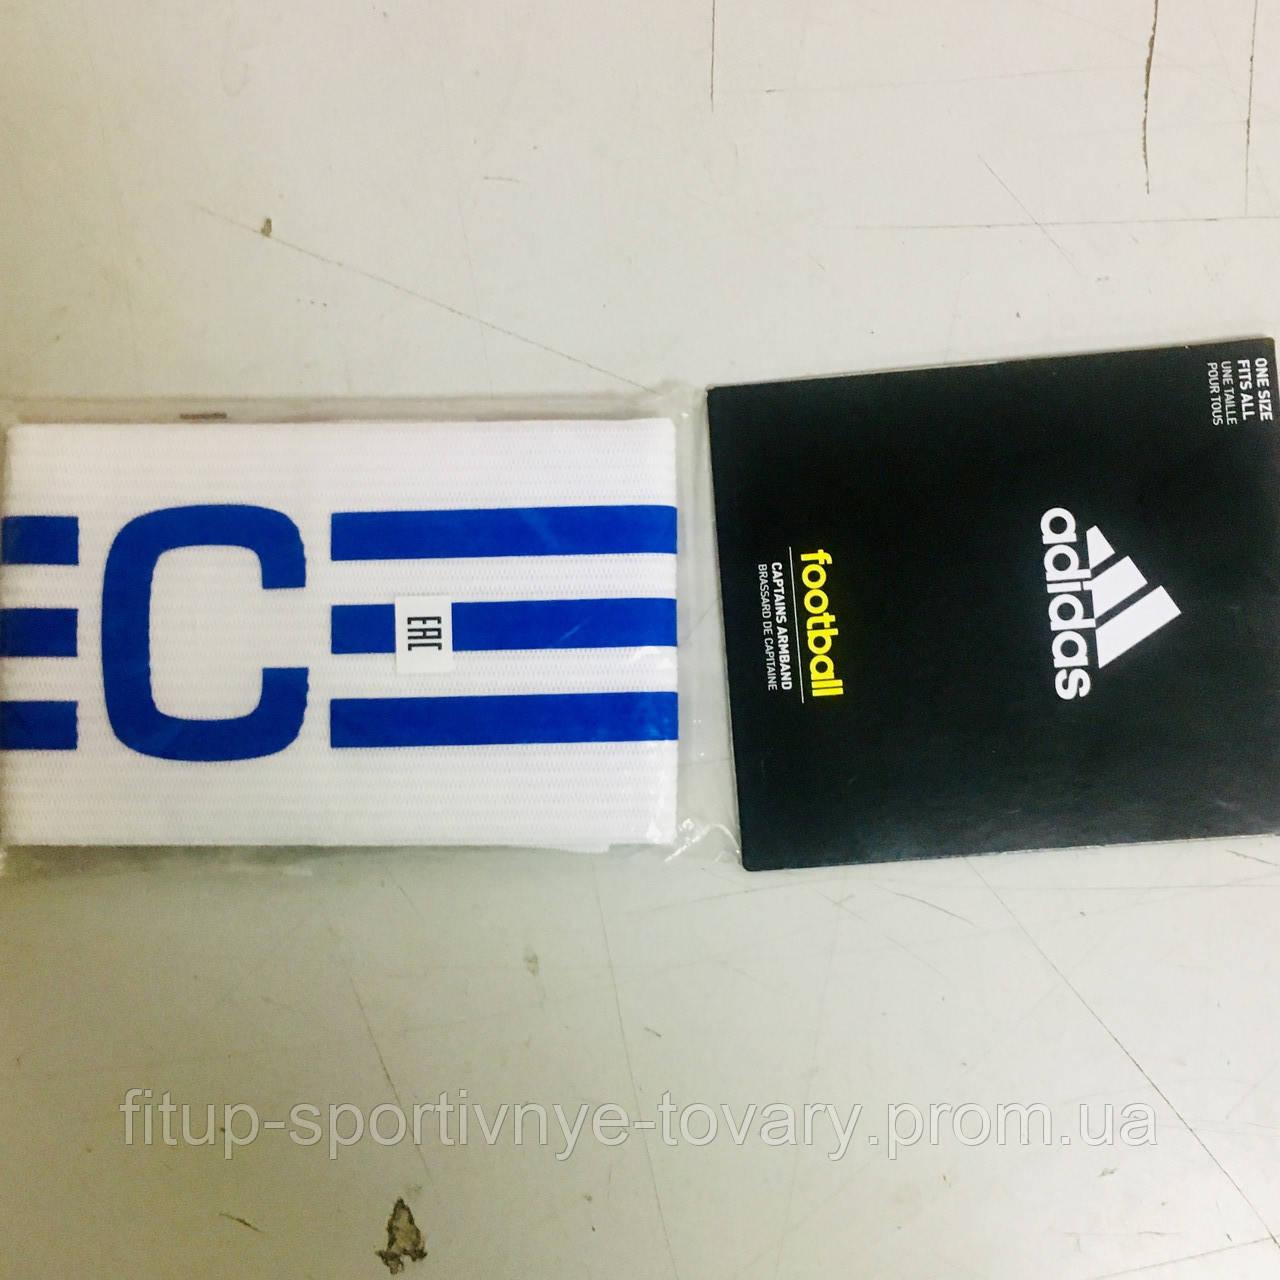 finest selection d87ae 515d1 Капитанская повязка Adidas FB CAPT ARMBAND BQ2536, цена 470 грн., купить в  Киеве — Prom.ua (ID 618608582)